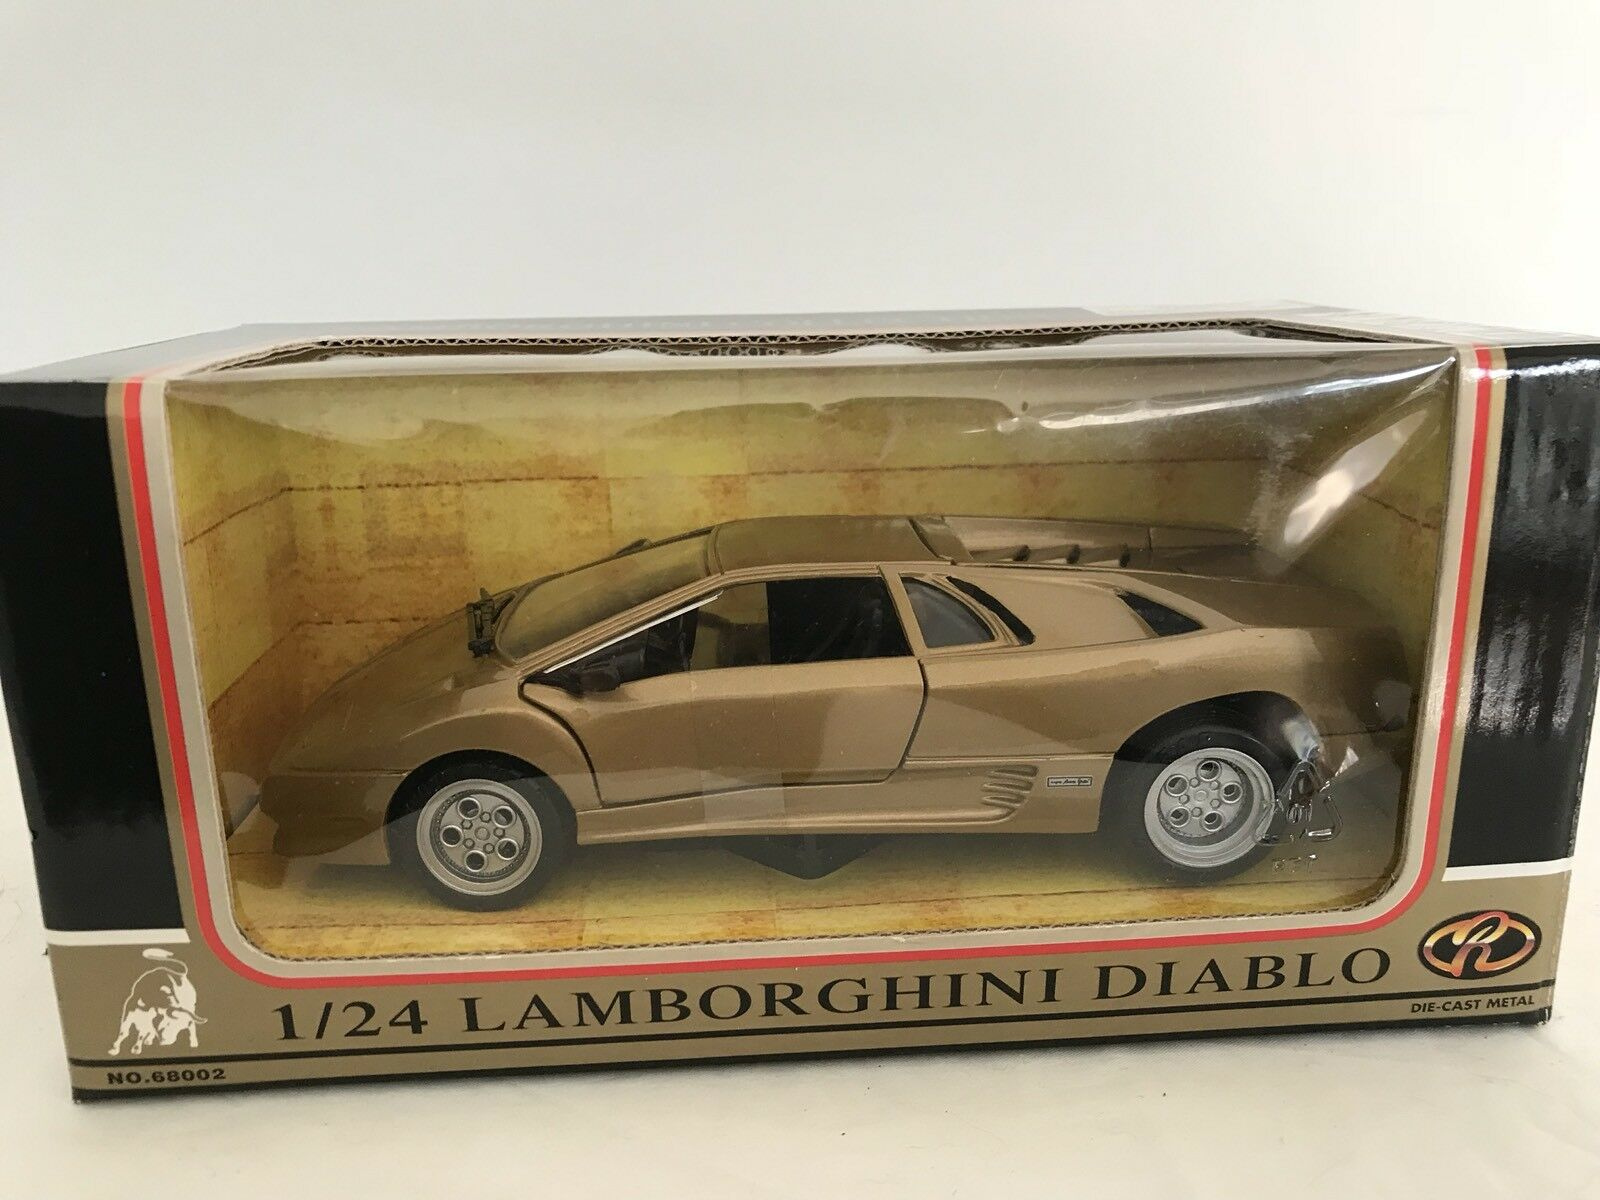 MotorMax 68002 Lamborghini Diablo gold 1 24 Mint & Boxed